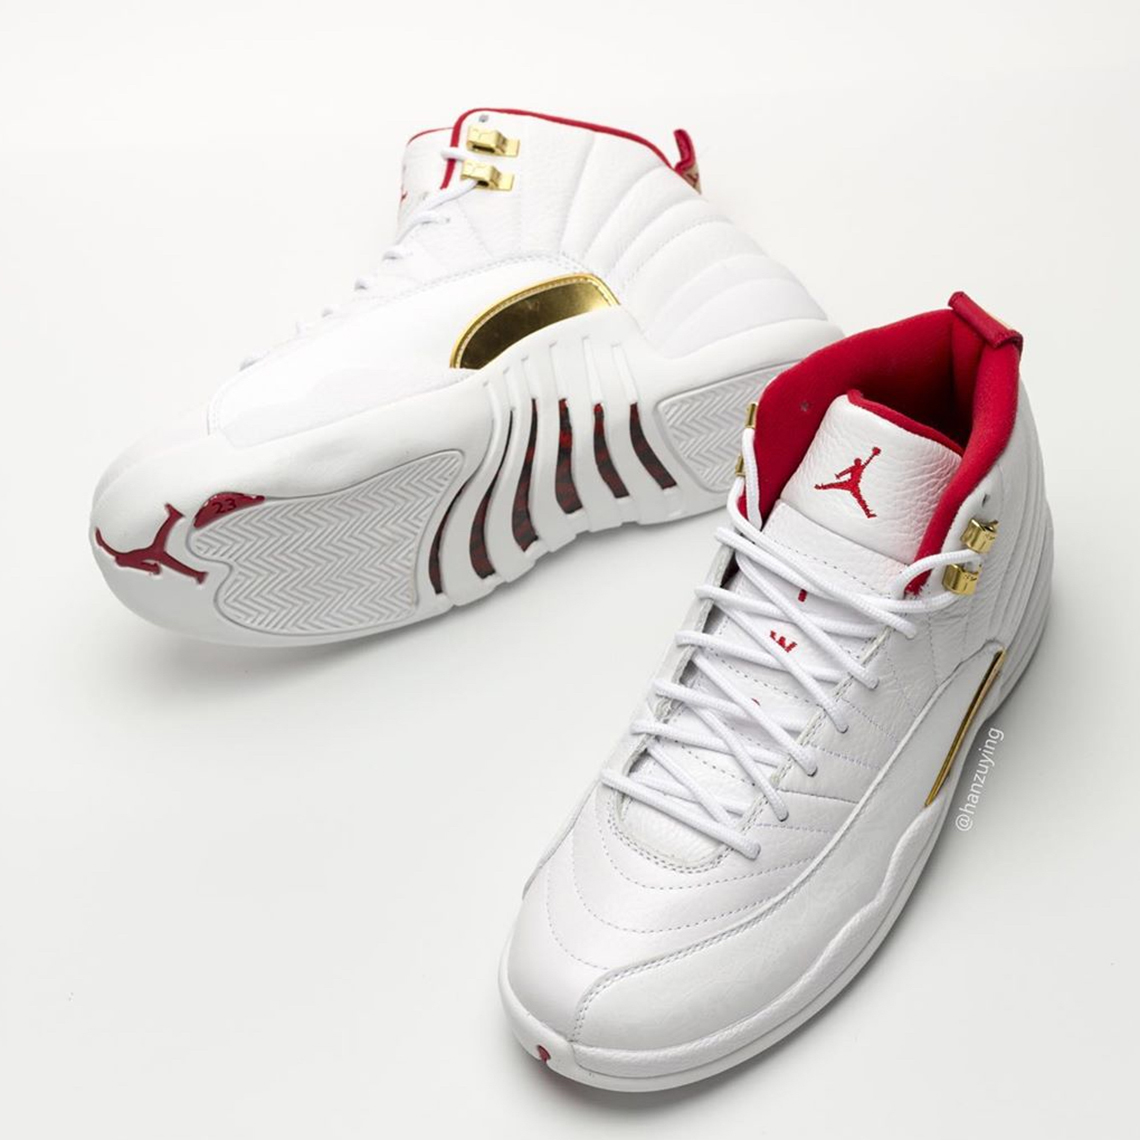 Jordan 12 FIBA 130690-107 Release Date